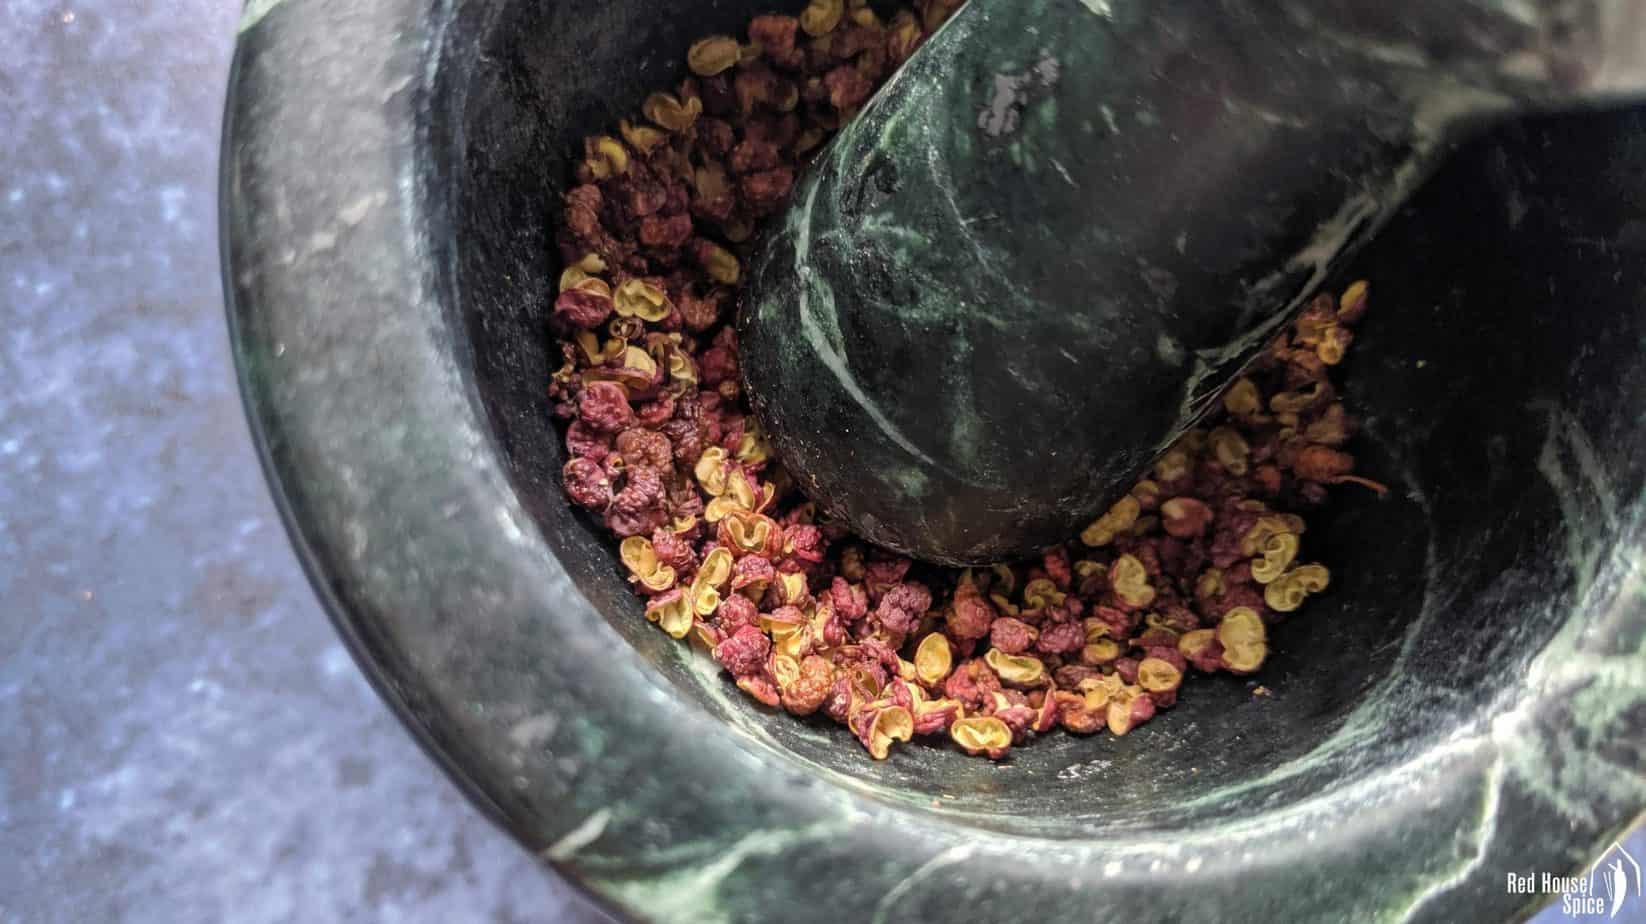 Roasted Sichuan pepper in a mortar